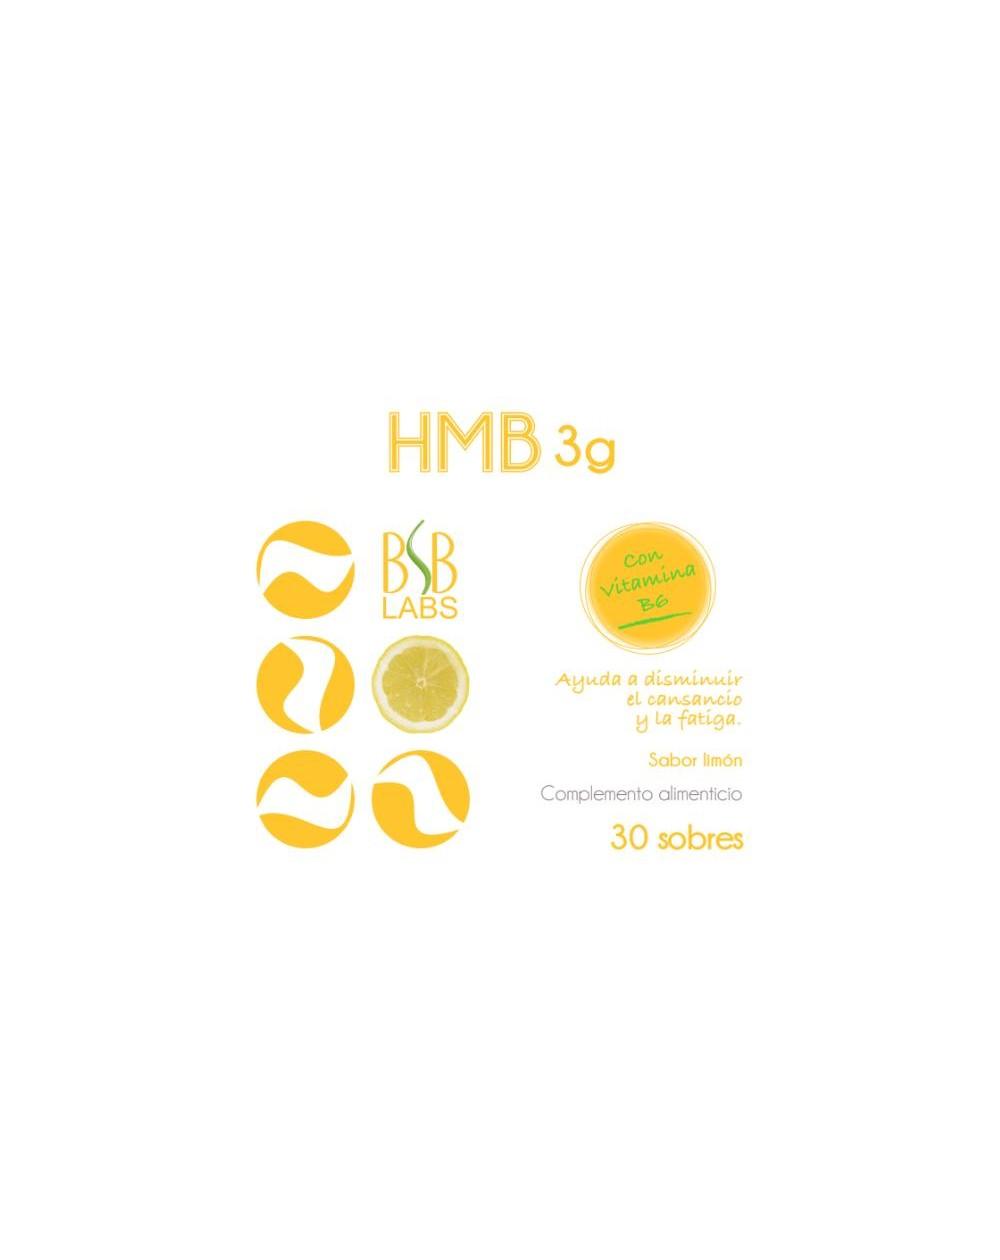 HMB 3 g 30 sobres